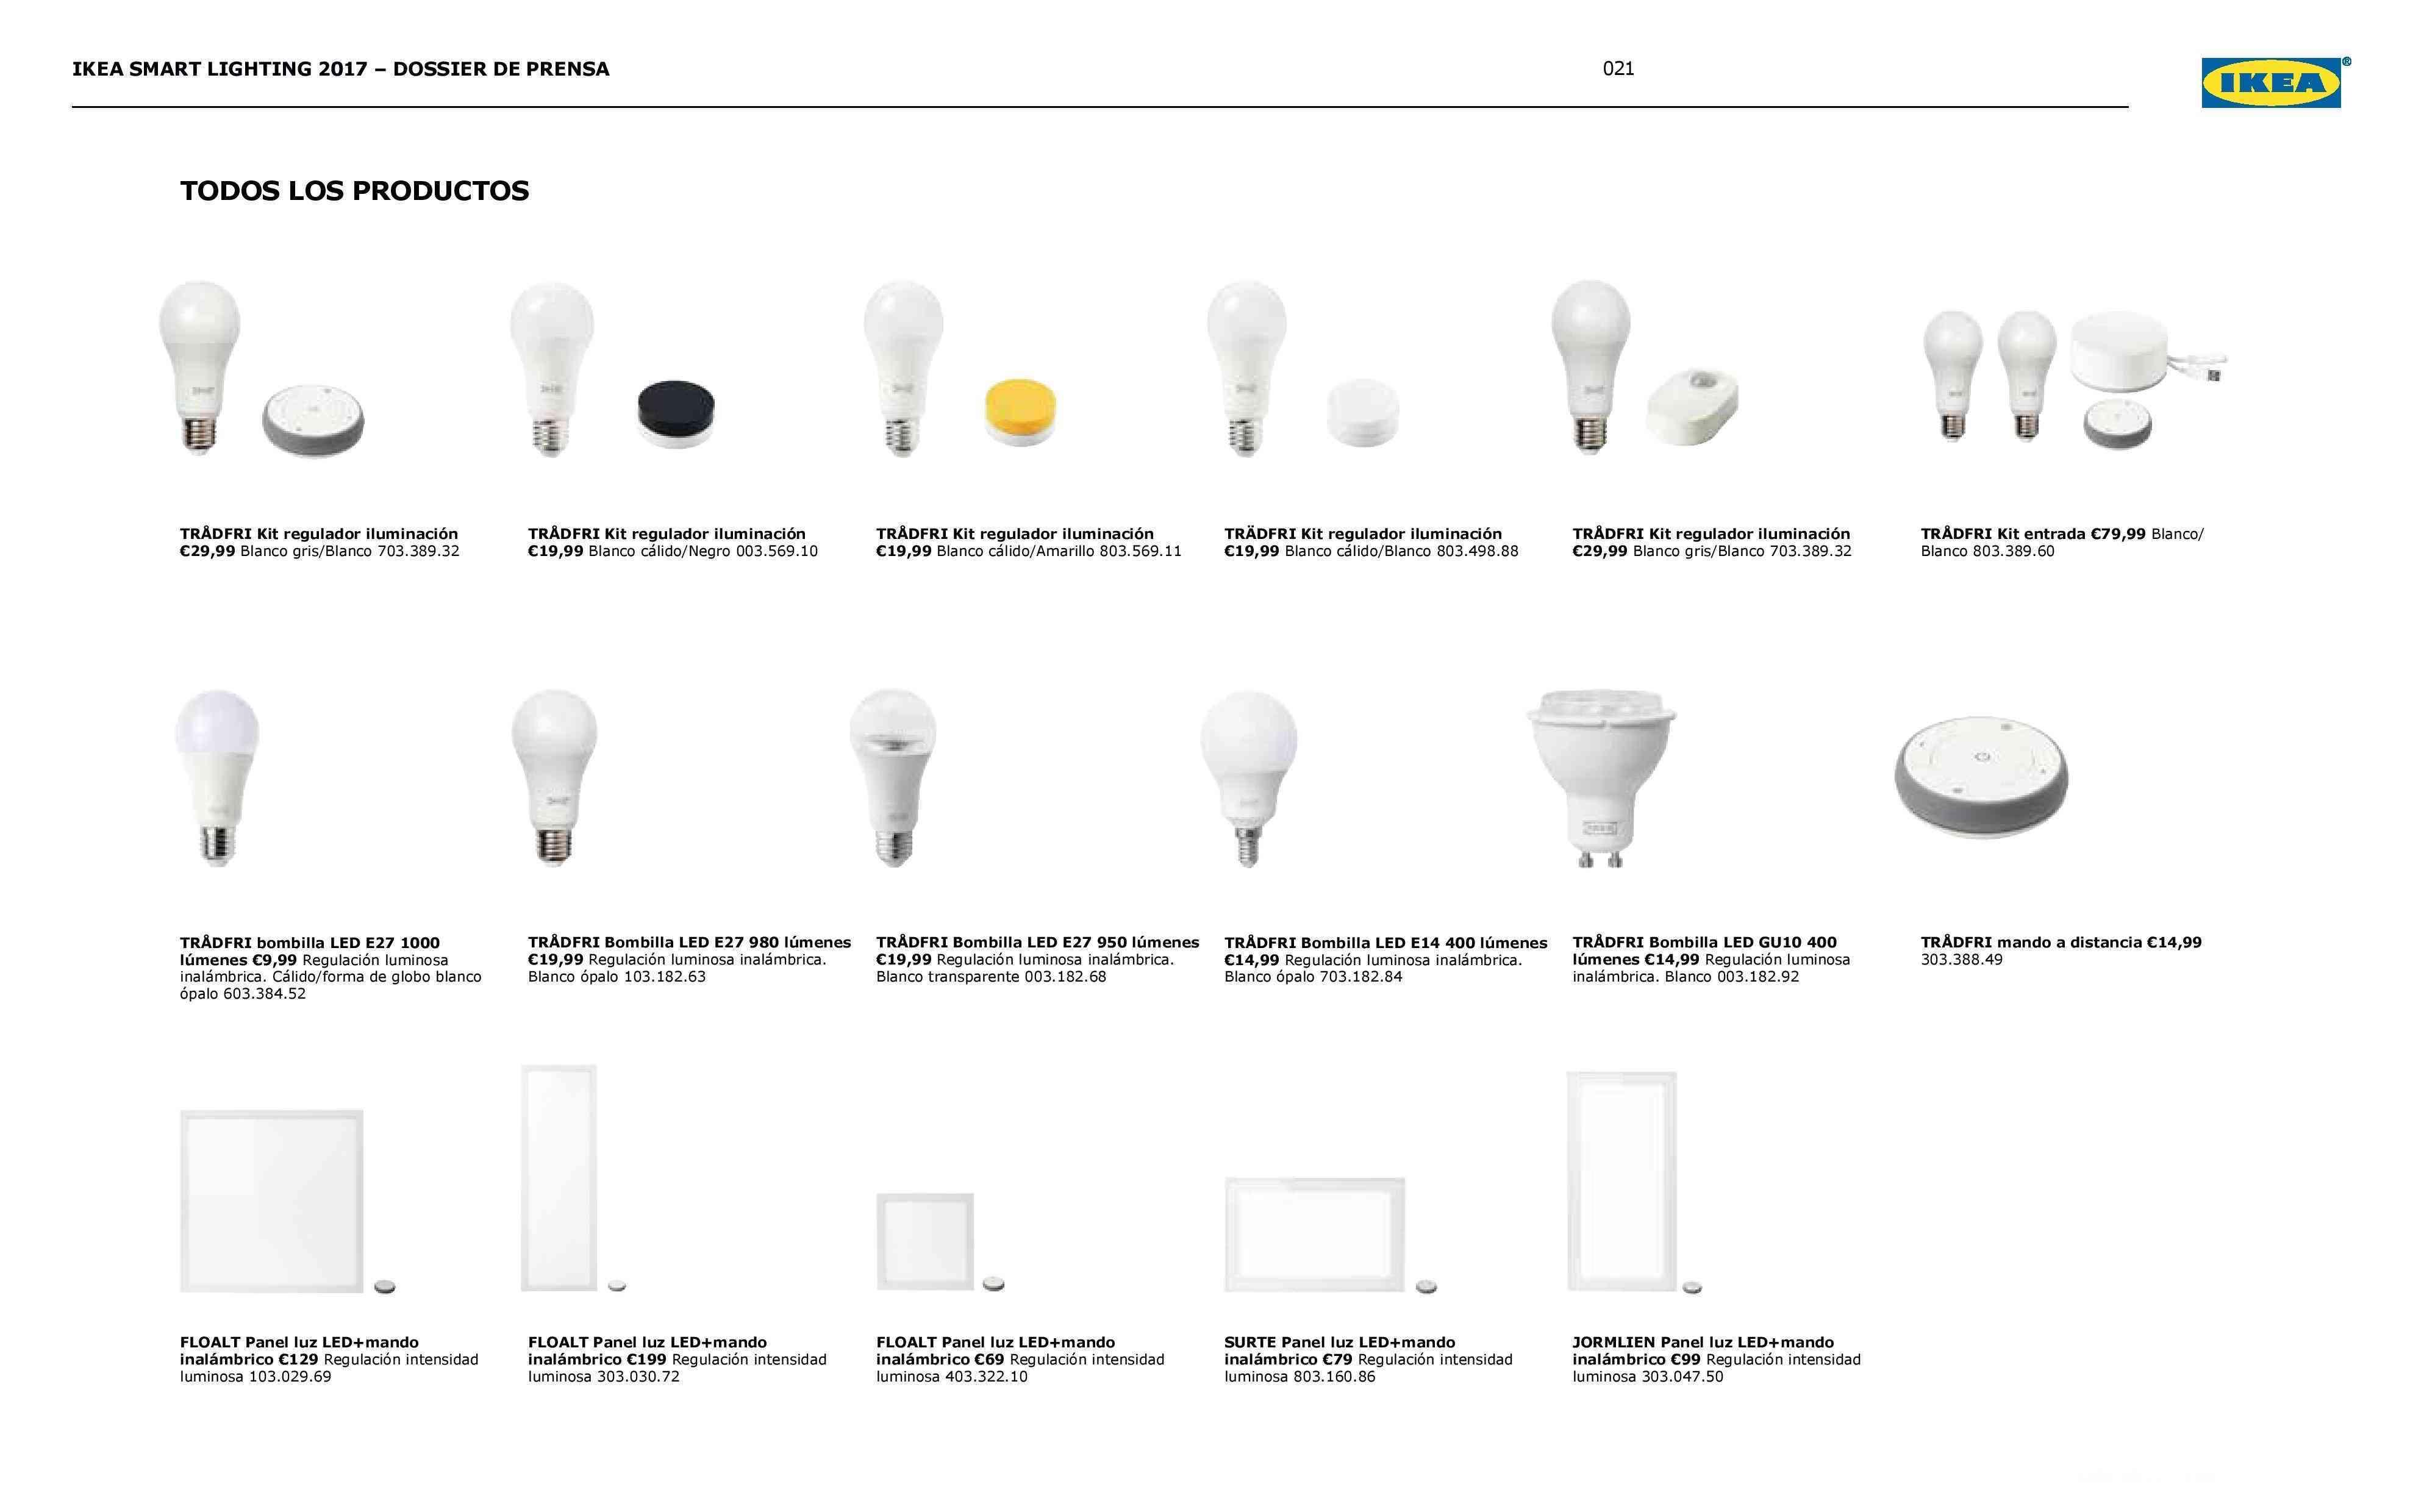 Novedades en iluminación de casas inteligentes con IKEA 77